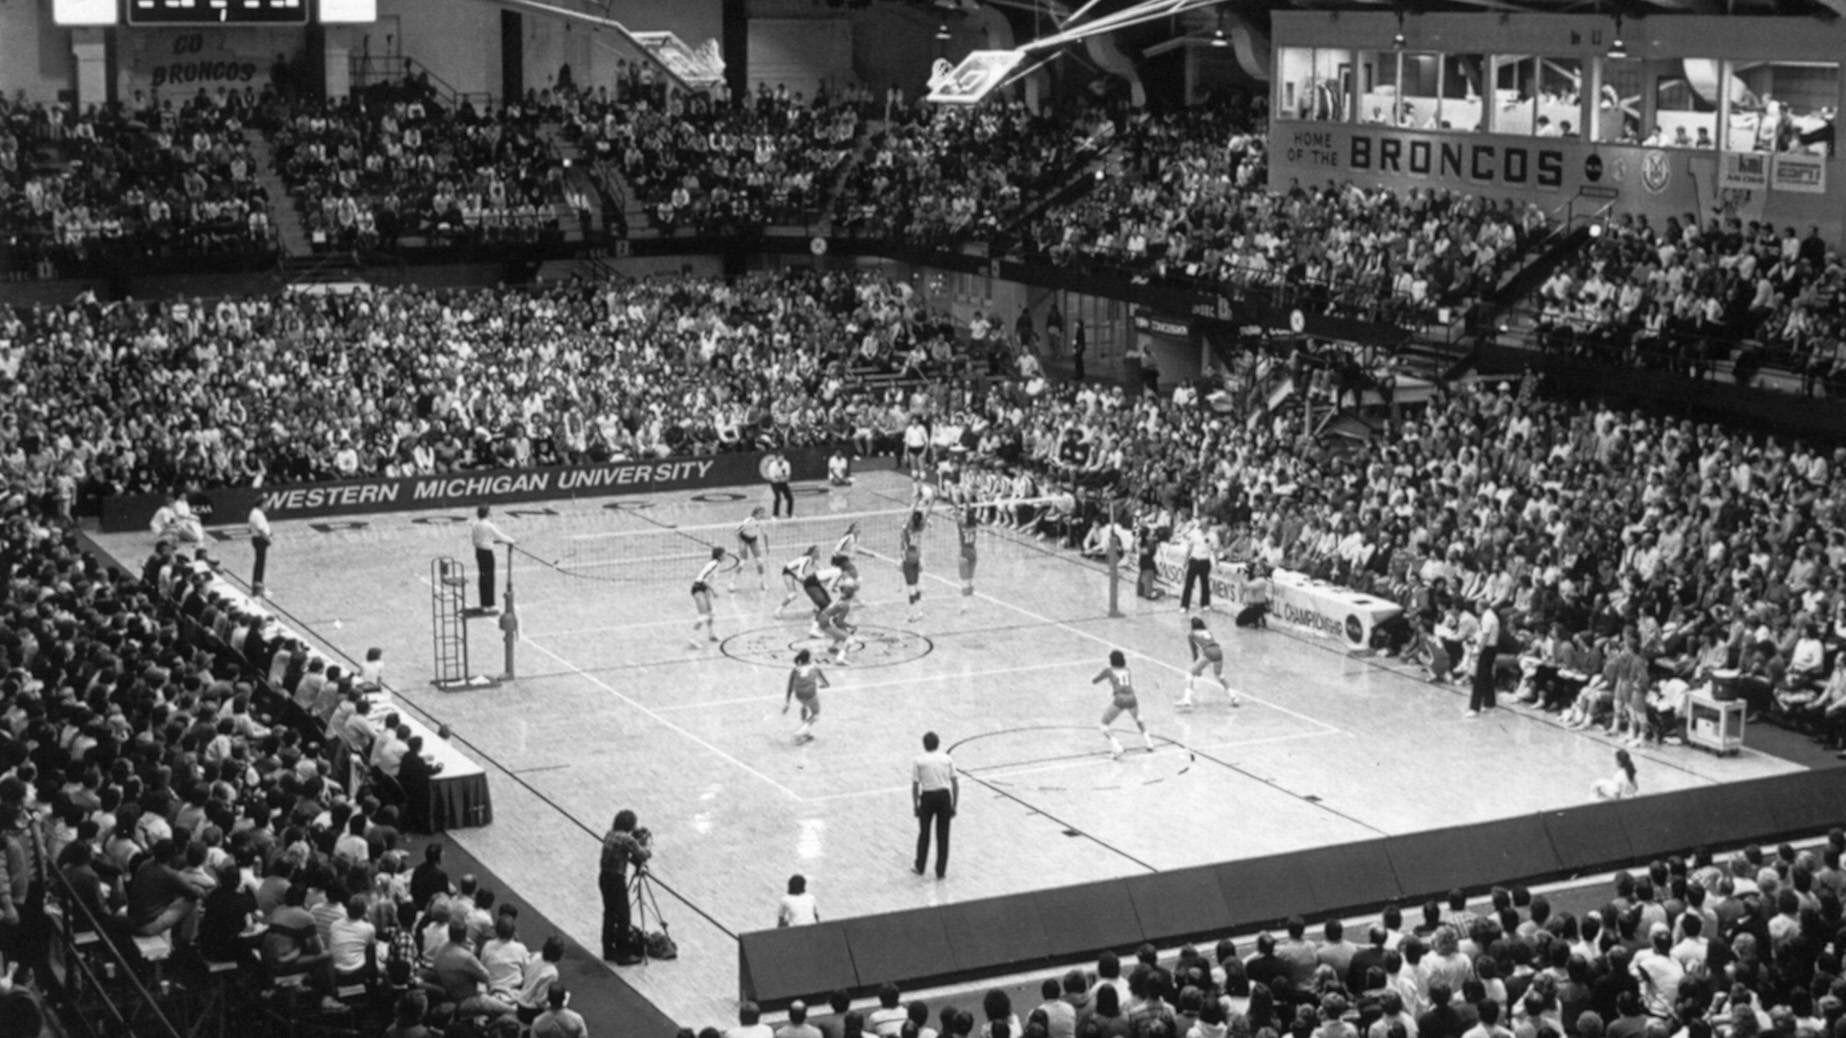 1985 Ncaa Championship Wmu Volleyball Net Volleyball Outdoor Volleyball Net